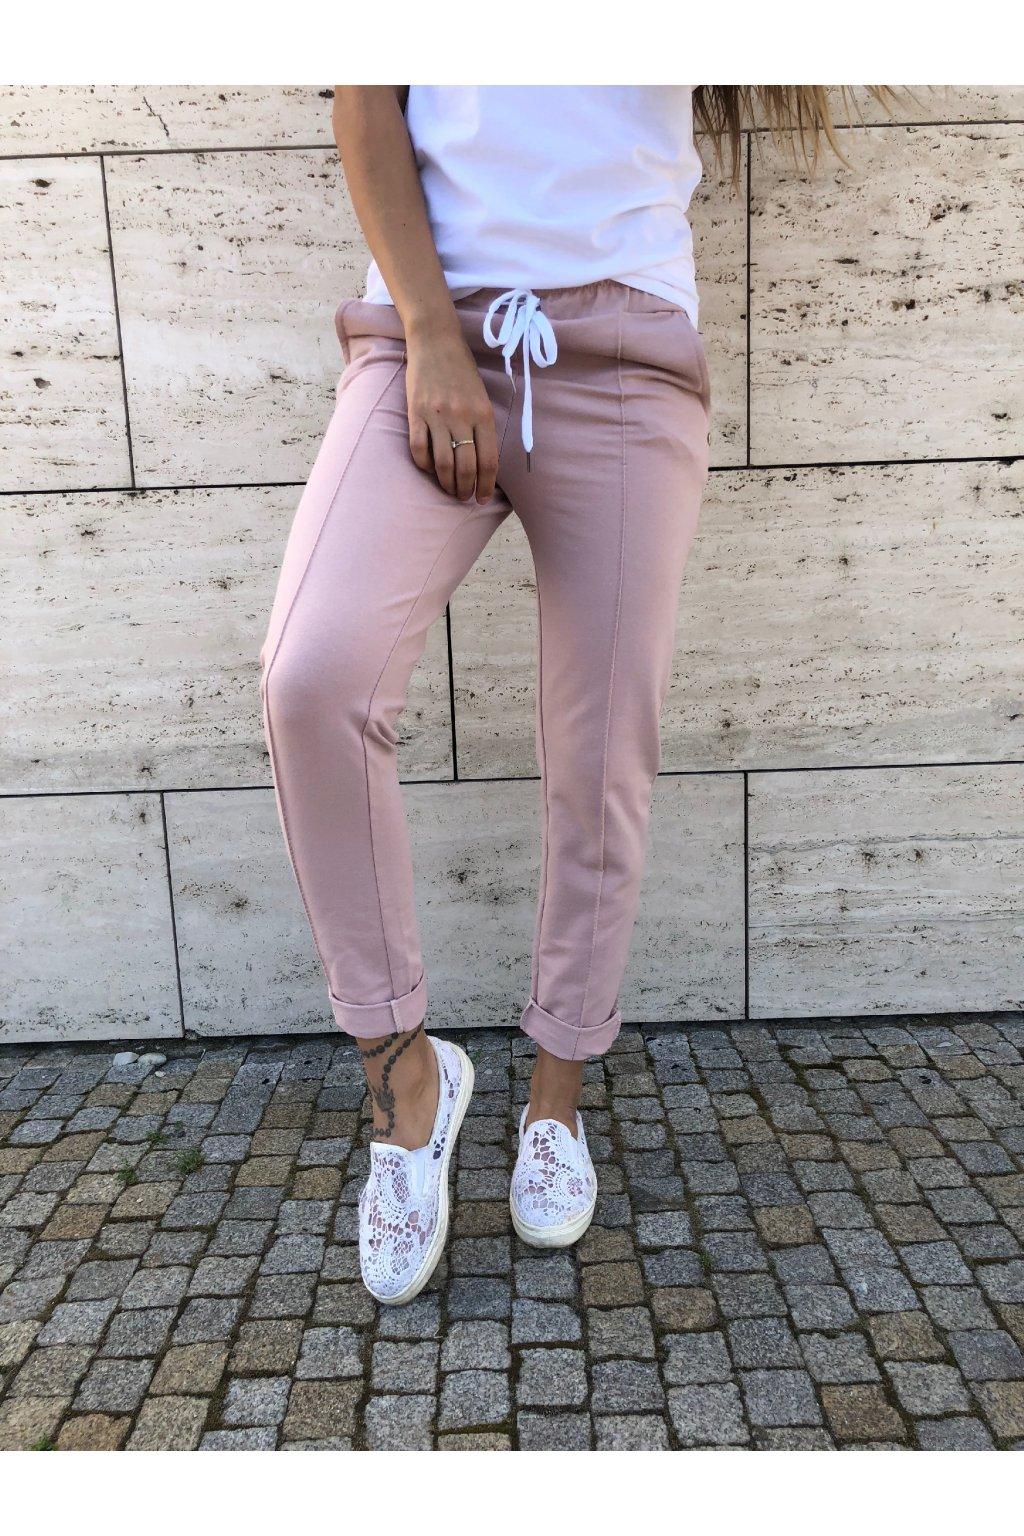 damske teplacky love powder pink eshopat cz 1